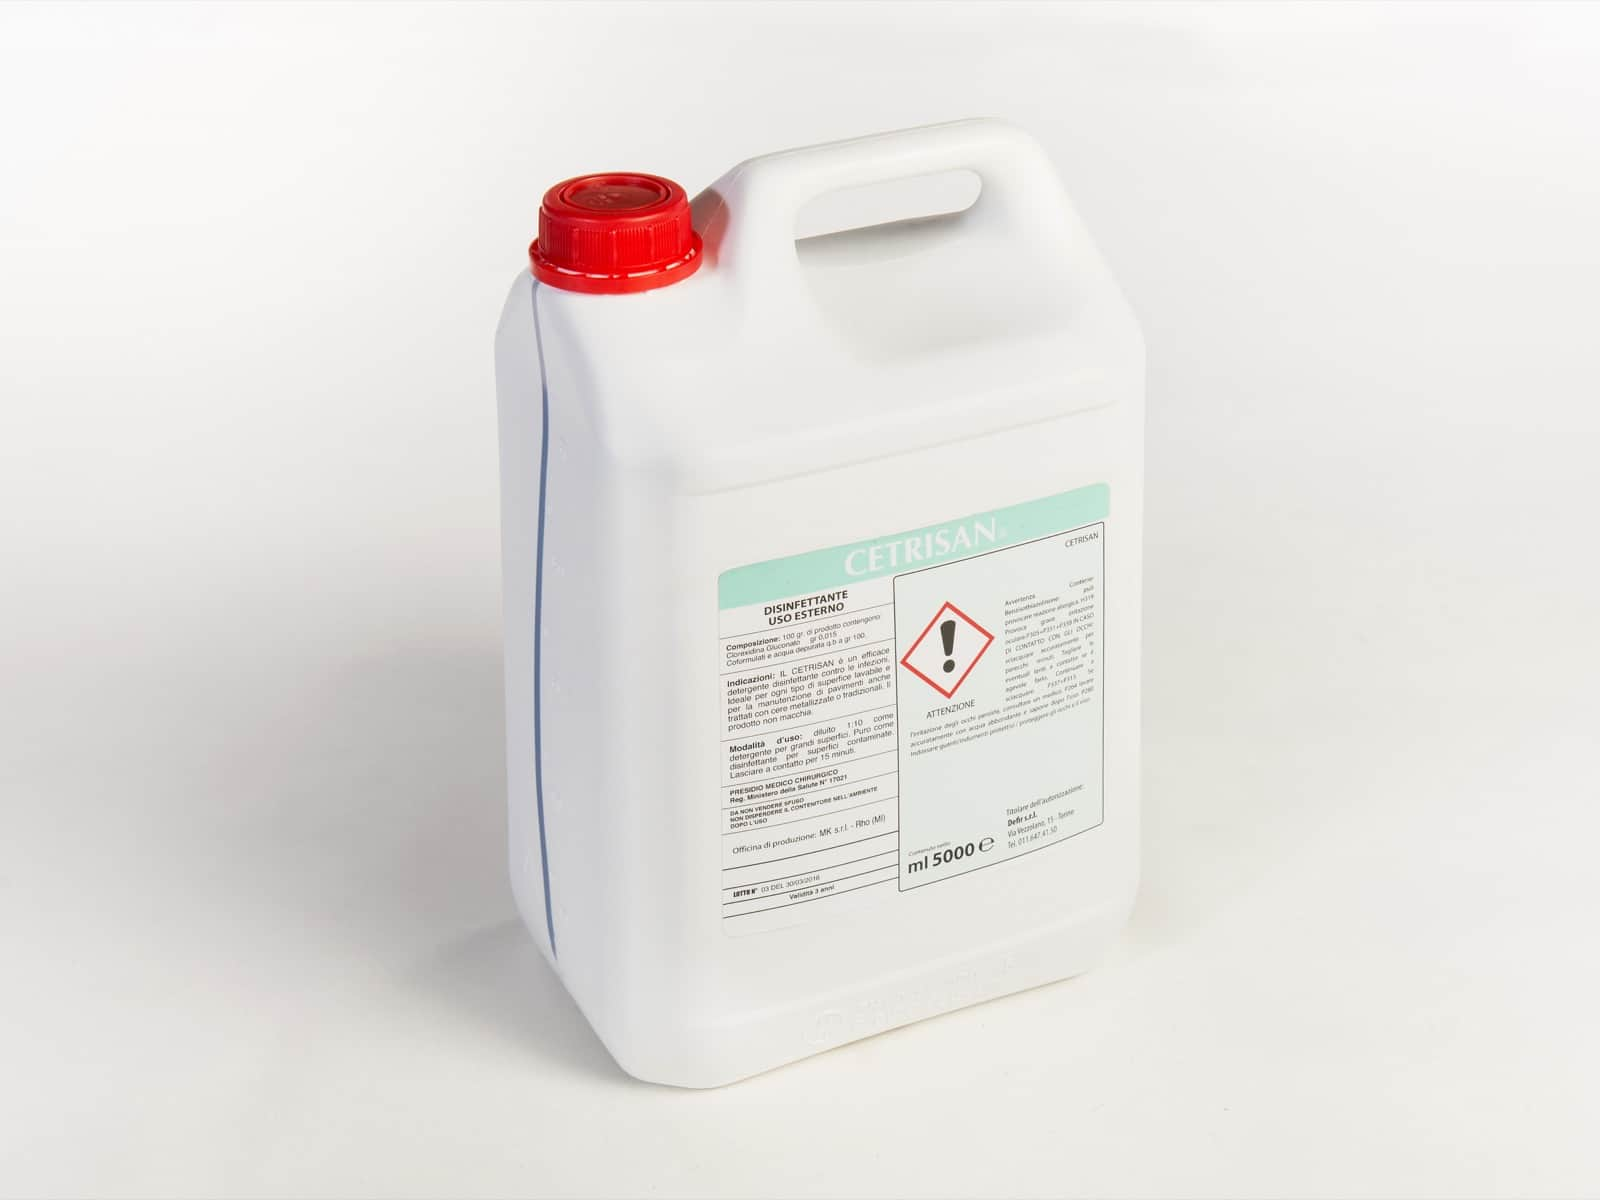 Gedis Cetrisan disinfettante 5L - Defir detergenti Moncalieri Torino